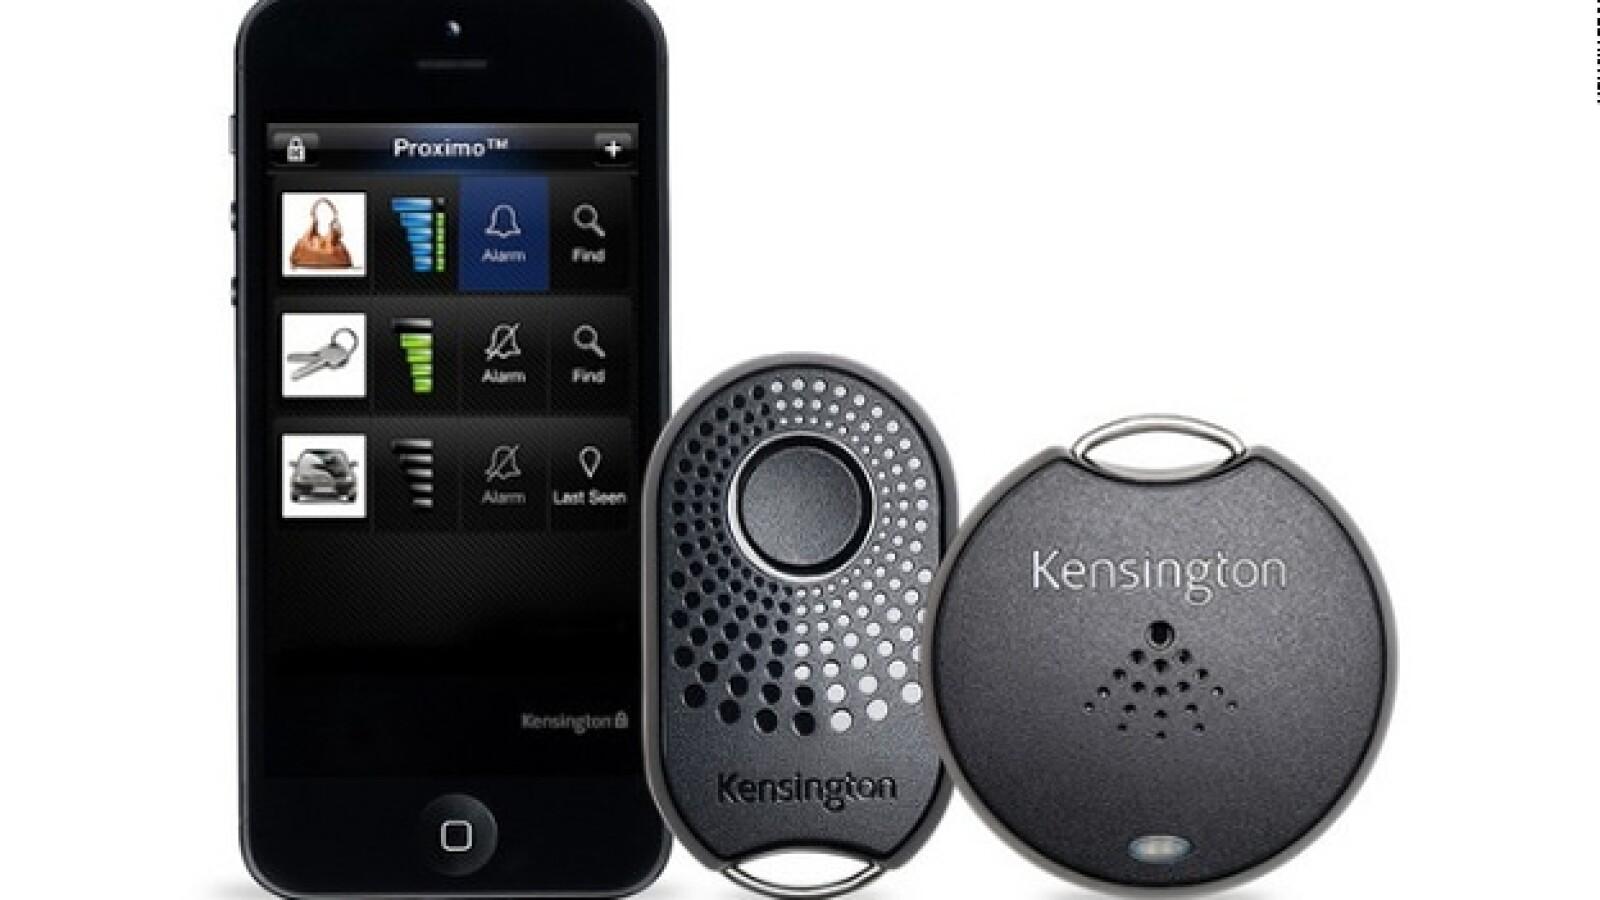 Kensington Proximo GPS tracking